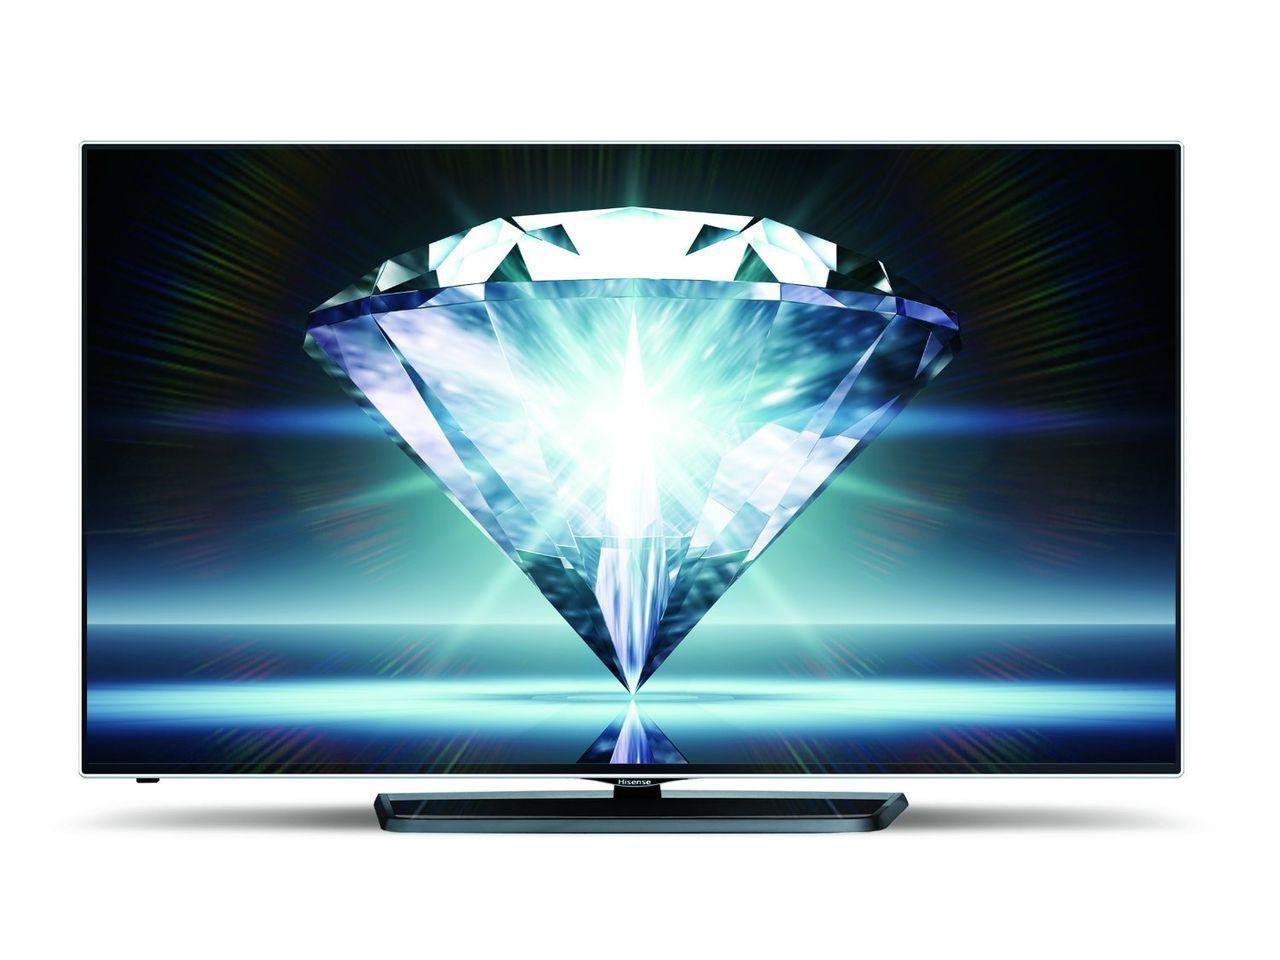 Телевизор Hisense LTDN55K681 (55 дюймов, Ultra HD, 4K, 3D, Smart TV, HDMI)